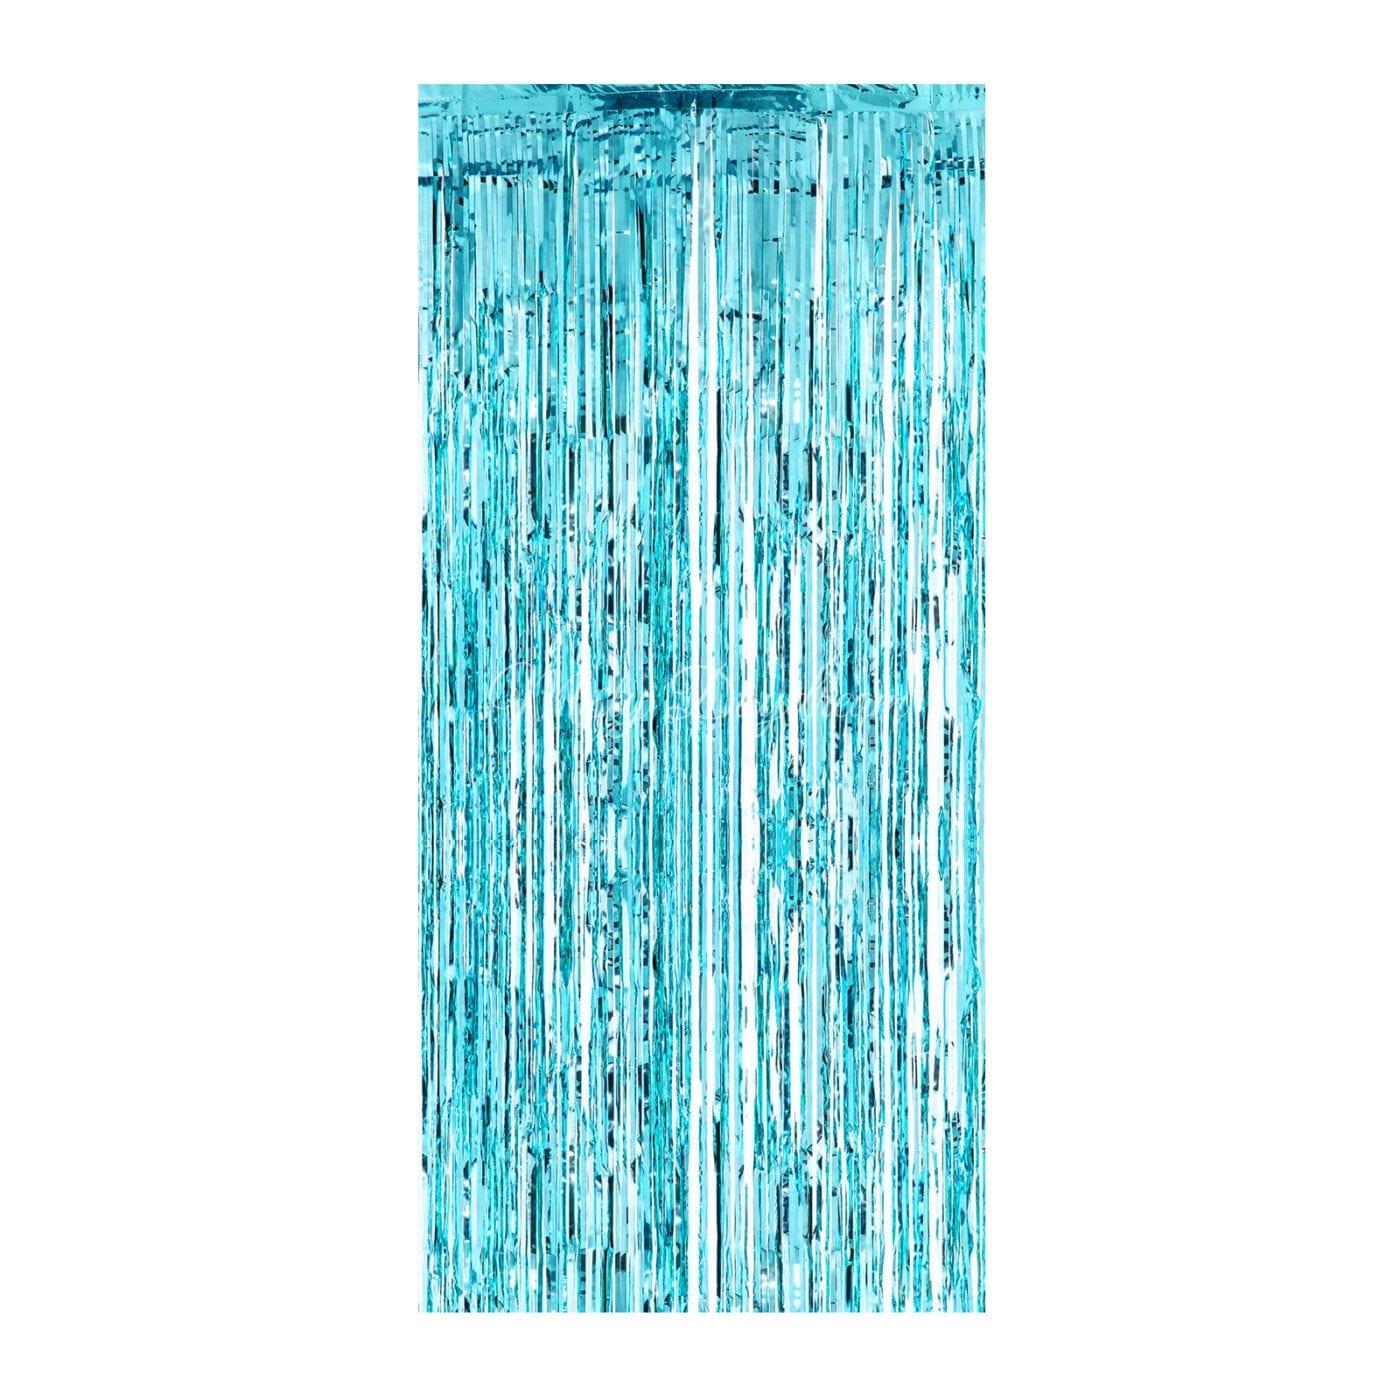 Home By Theme Frozen Metallic AQUA Tinsel Curtain Backdrops 200cm X 100cm